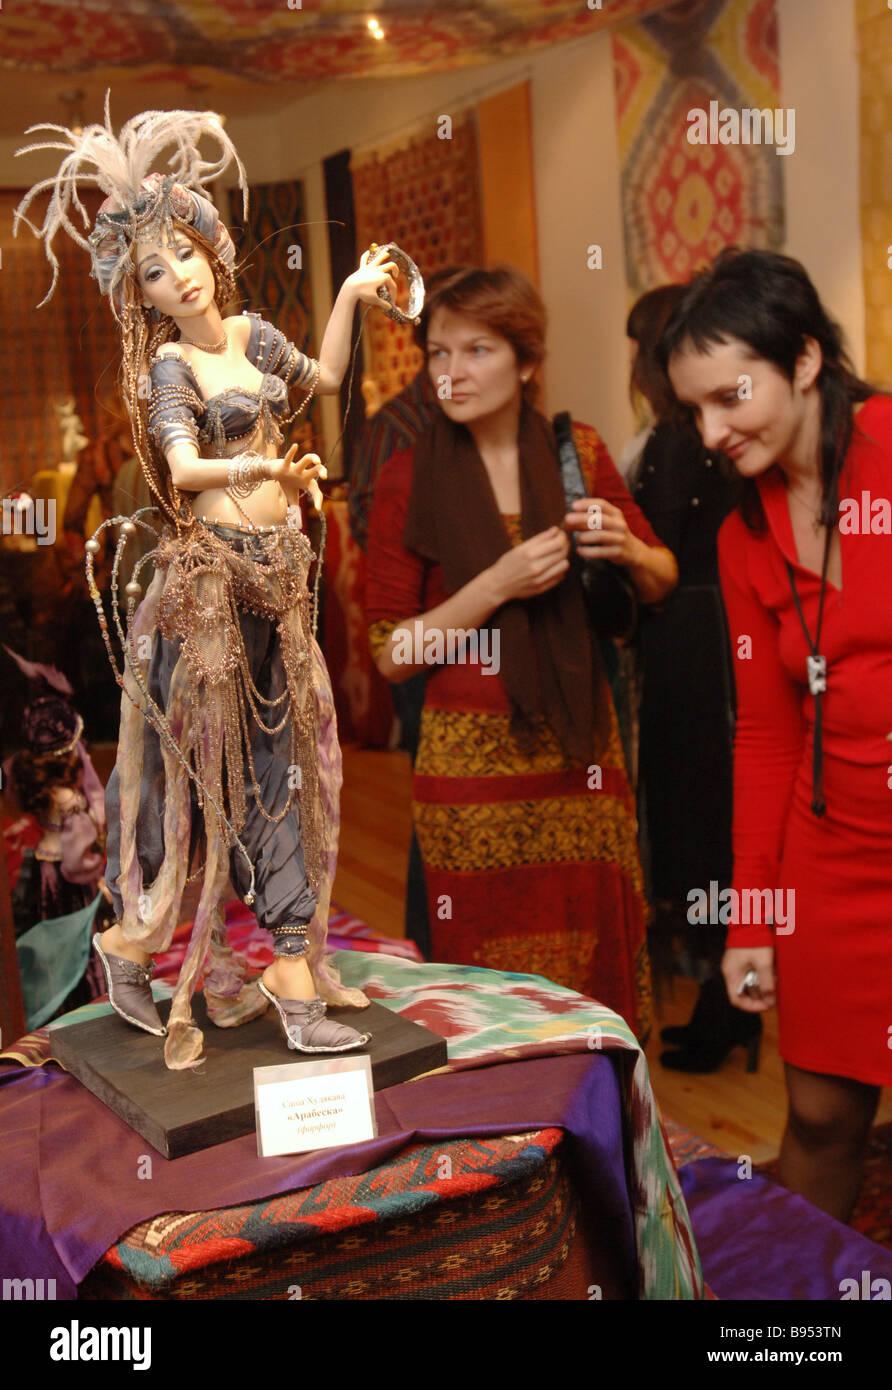 Arabesque porcelain by Sasha Khudyakova an item from the exhibition of artistic dolls Oriental Fantasies - Stock Image